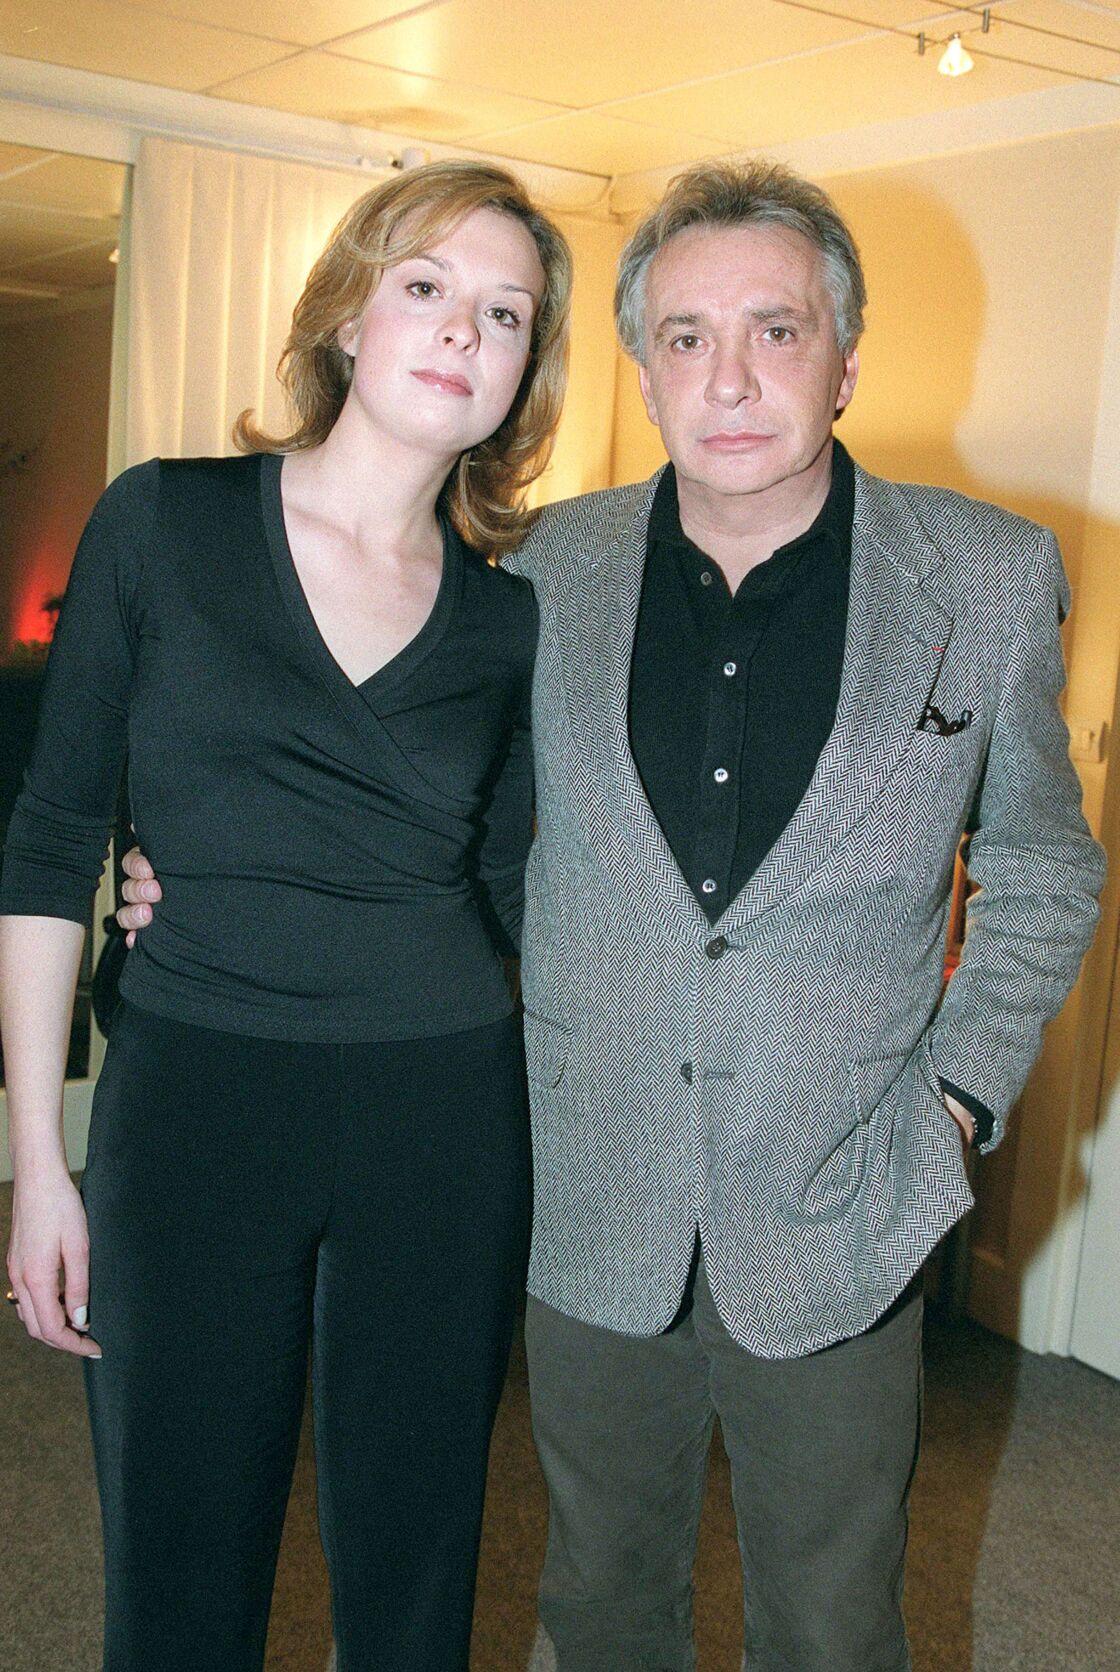 Michel Sardou et sa fille Cynthia Sardou en 2001